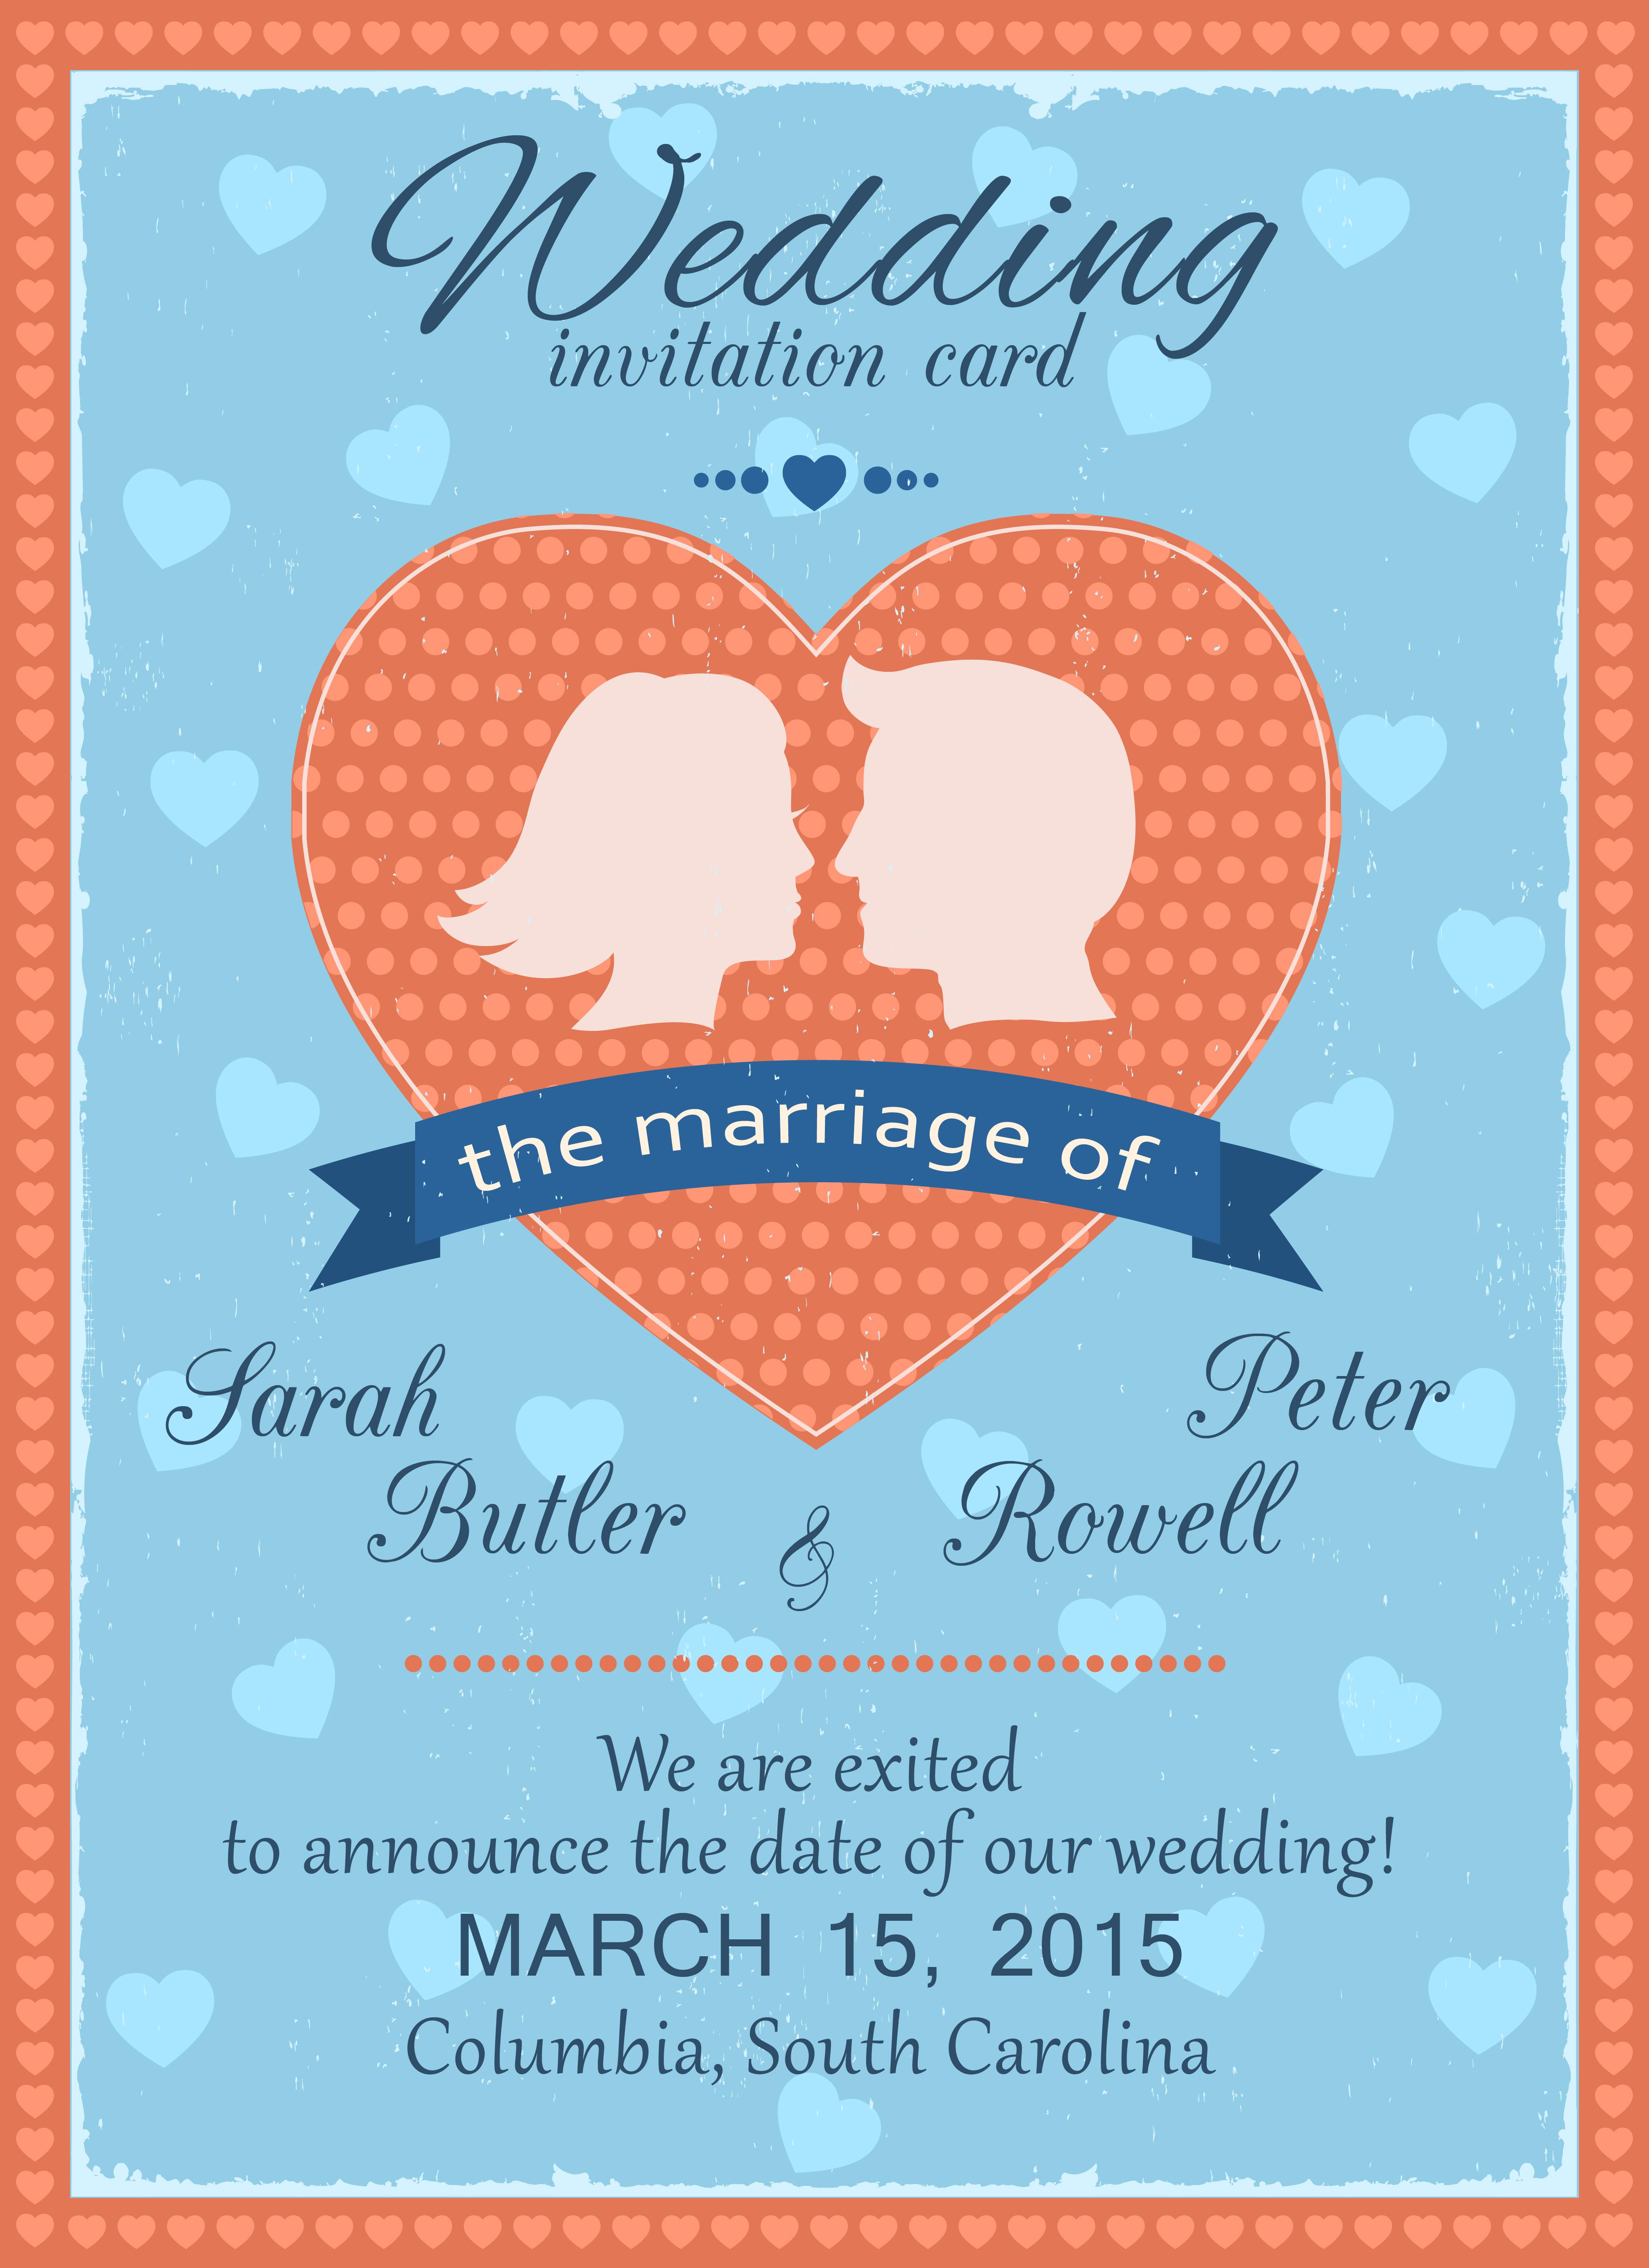 wedding invitation card  download free vectors clipart